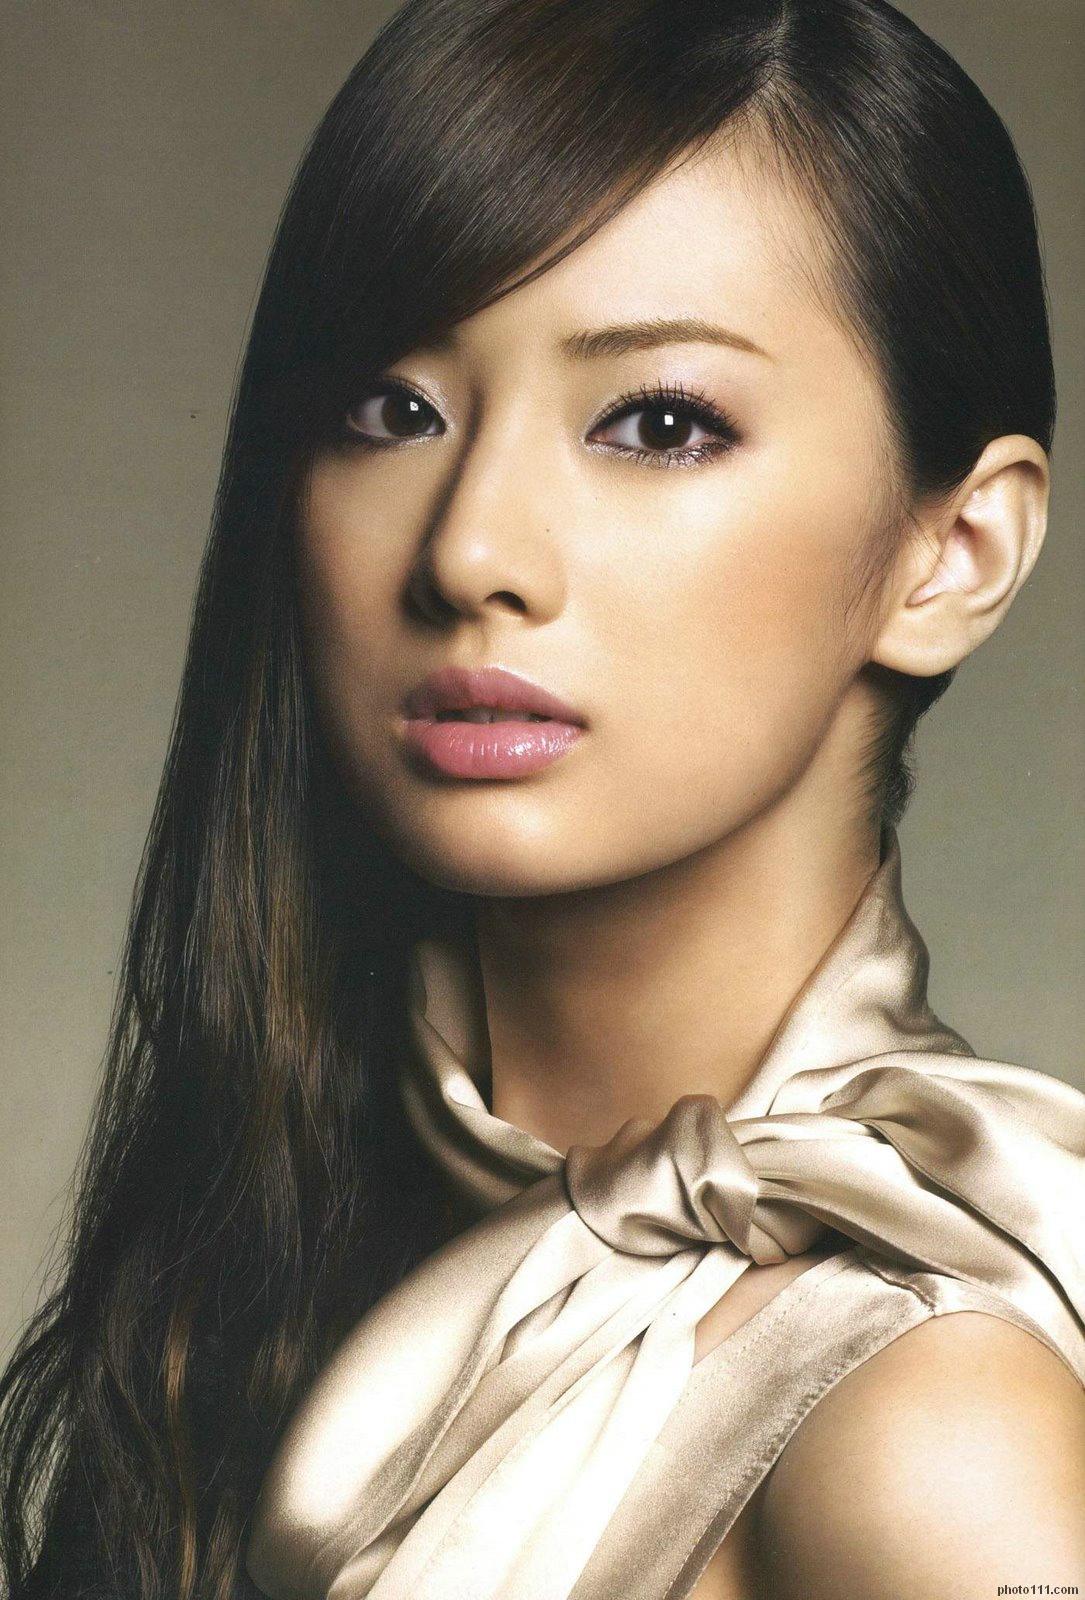 Keiko Kitagawa Net Worth